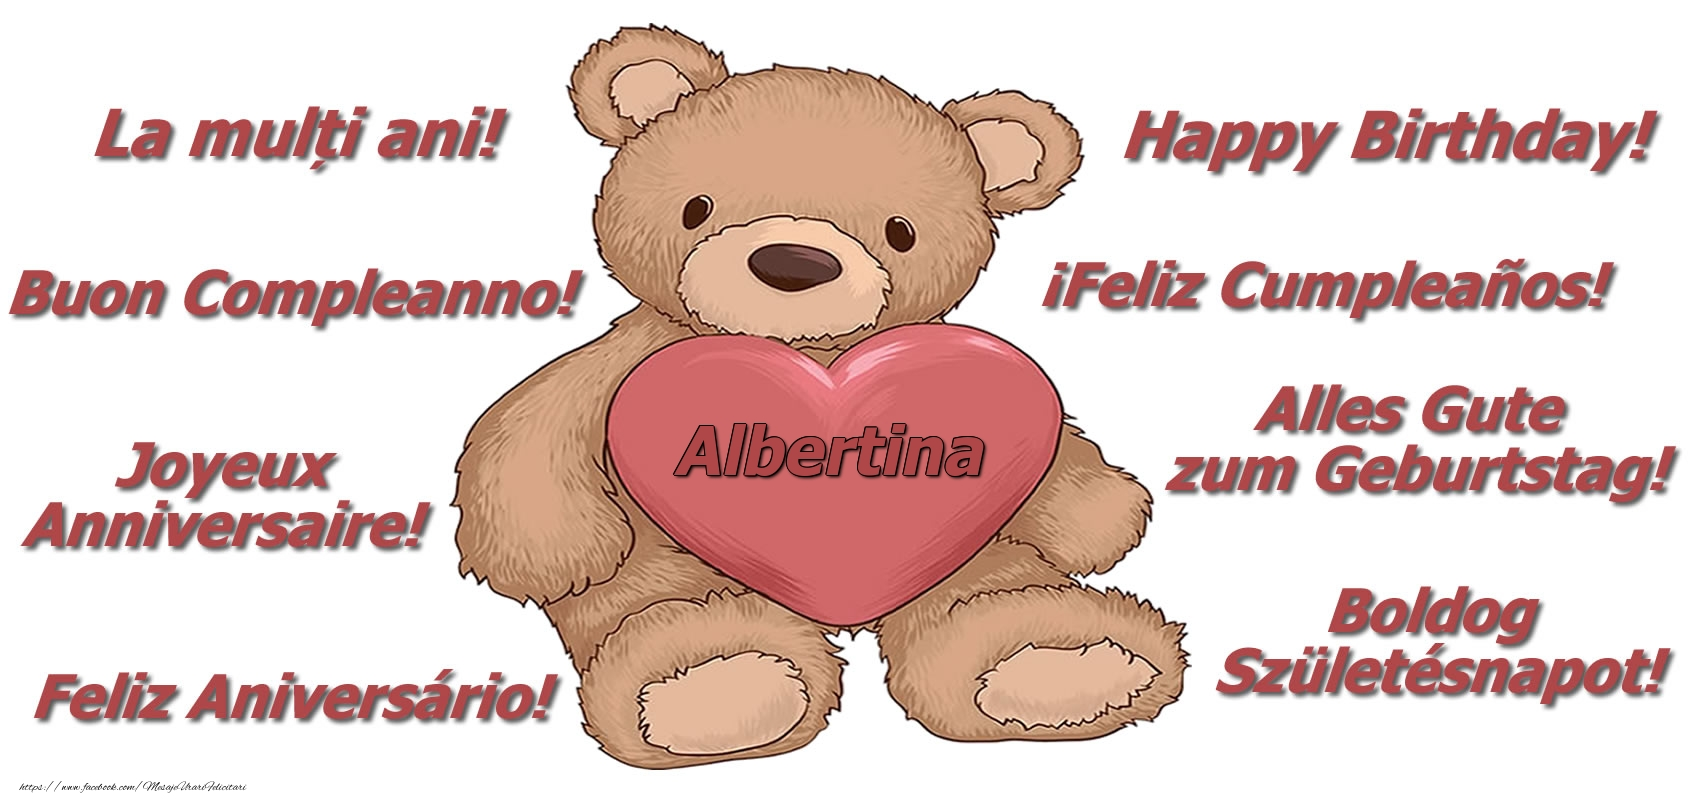 Felicitari de zi de nastere - La multi ani Albertina! - Ursulet